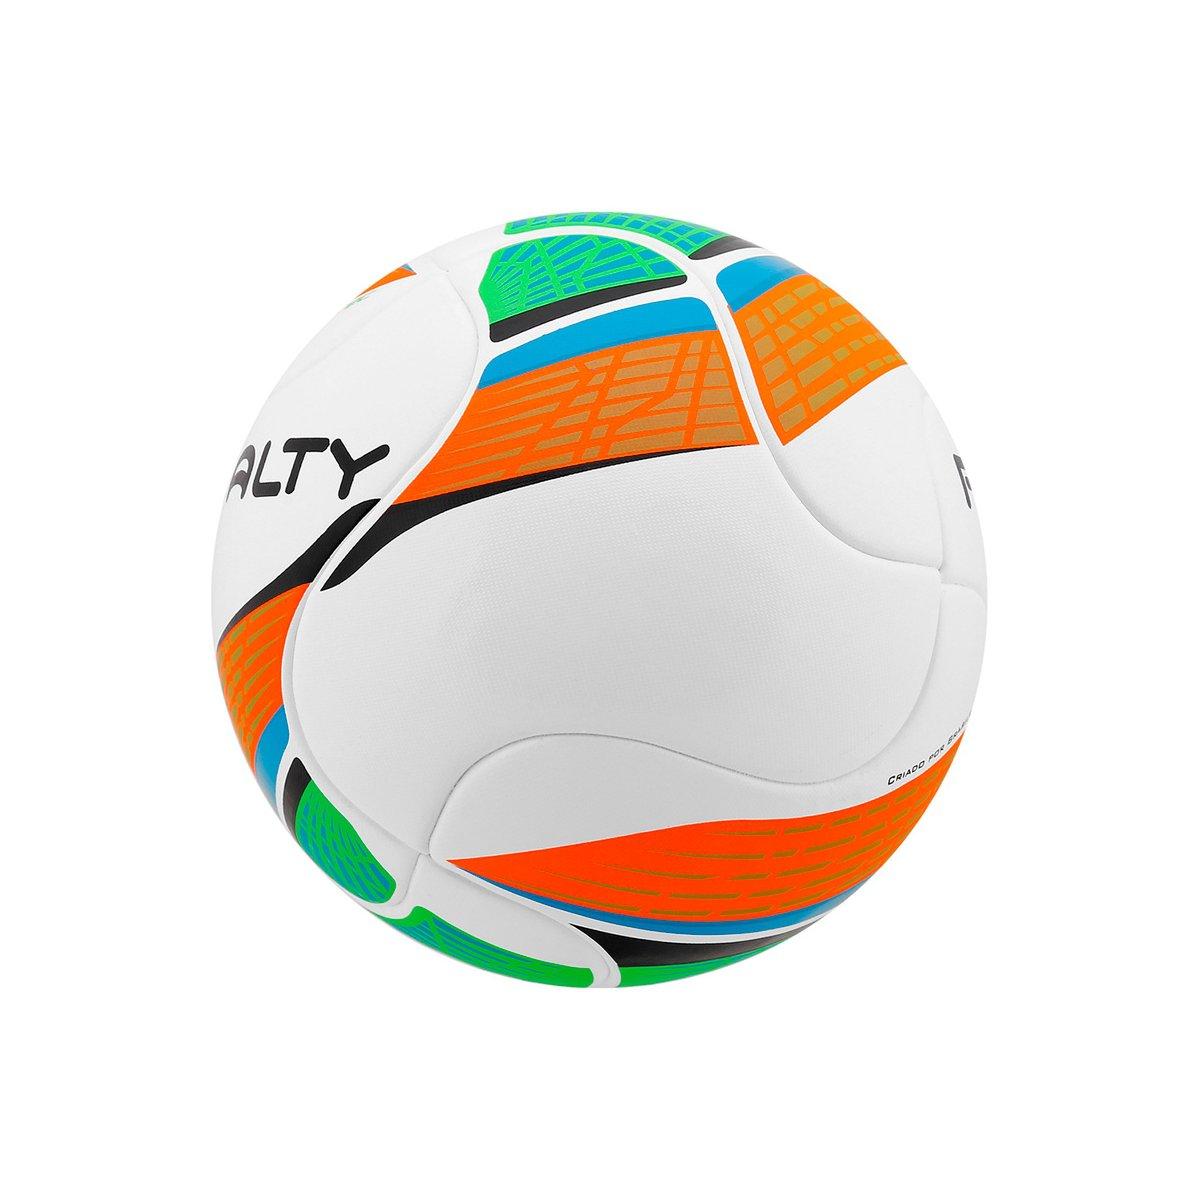 417b68a720 Bola Futsal Penalty Max 1000 Pró - Compre Agora